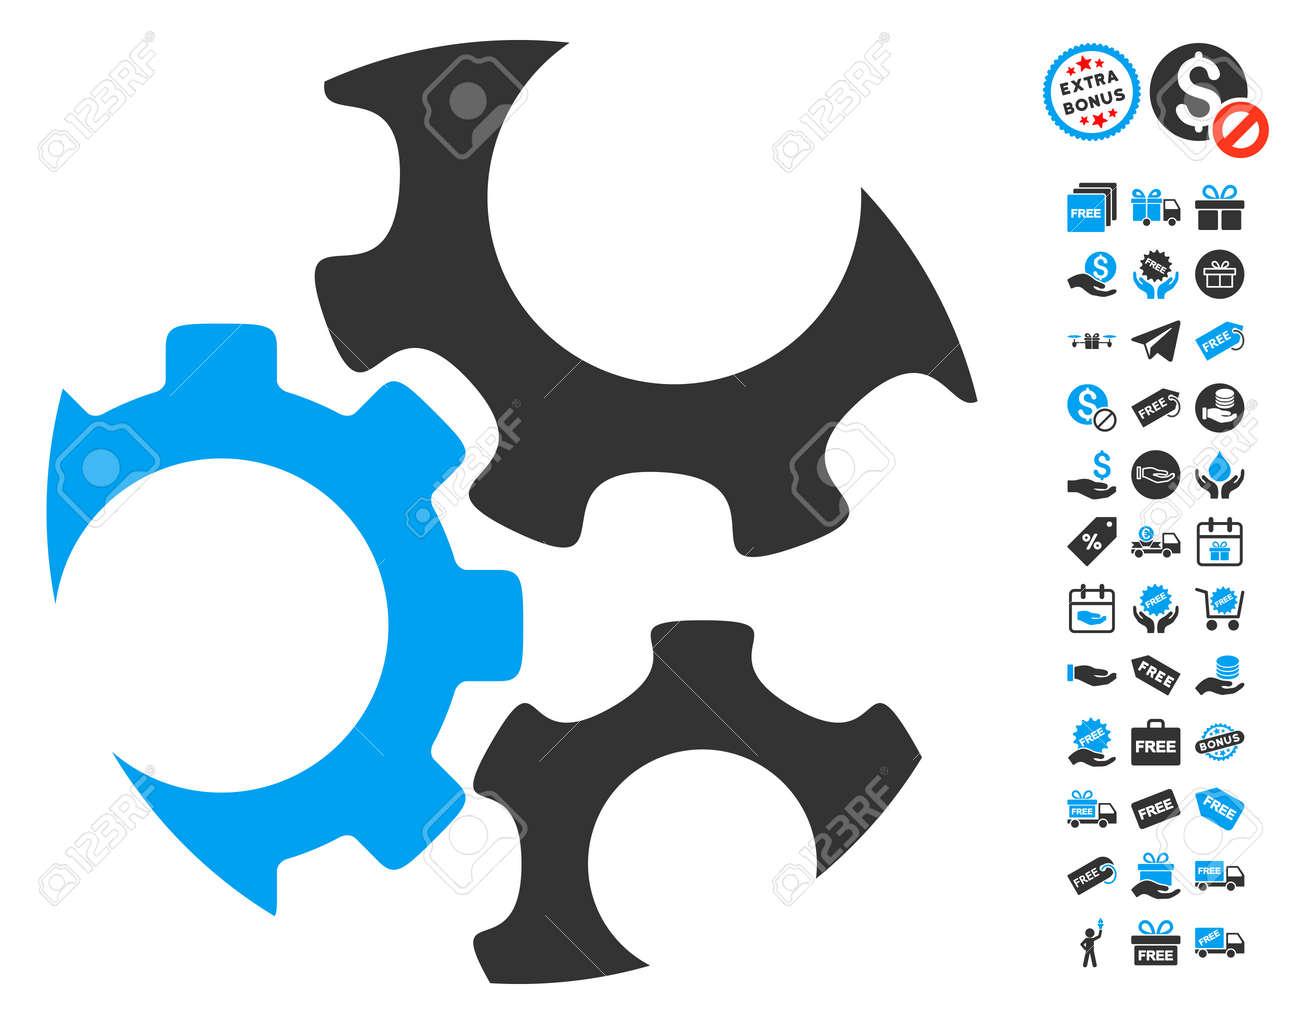 Mechanics gears icon with free bonus symbols vector illustration mechanics gears icon with free bonus symbols vector illustration style is flat iconic symbols biocorpaavc Images